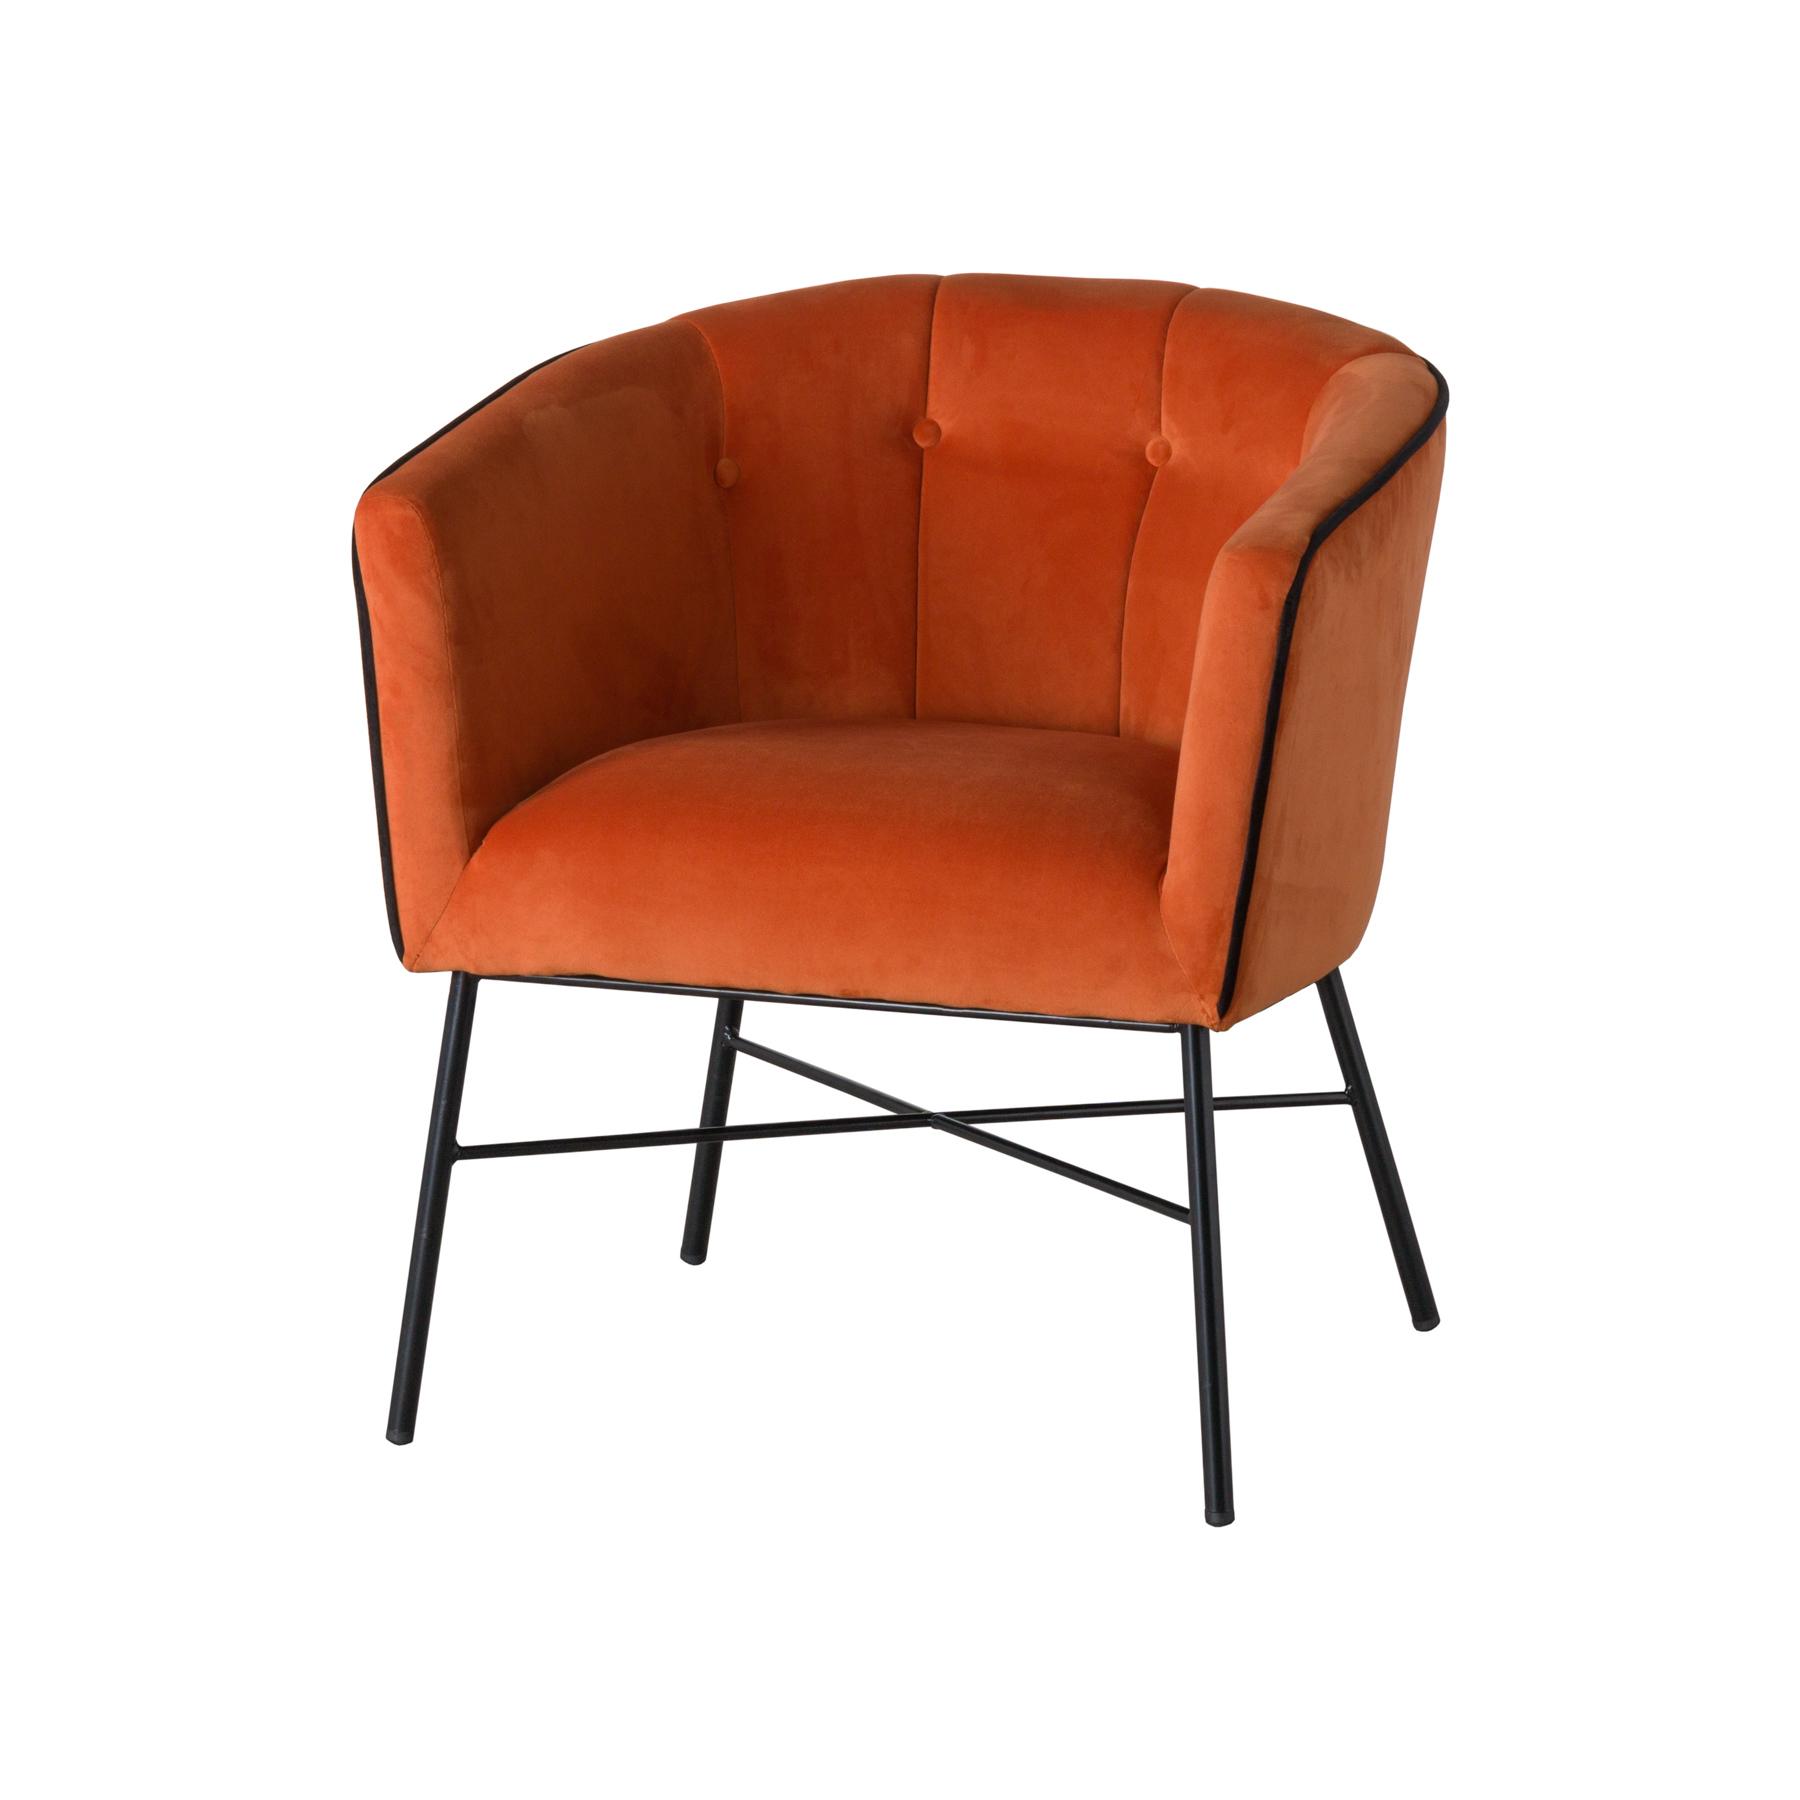 Amazing Free Shipping Rust Orange Velvet Occasional Accent Chair Armchair In Mid Century Modern Style Creativecarmelina Interior Chair Design Creativecarmelinacom